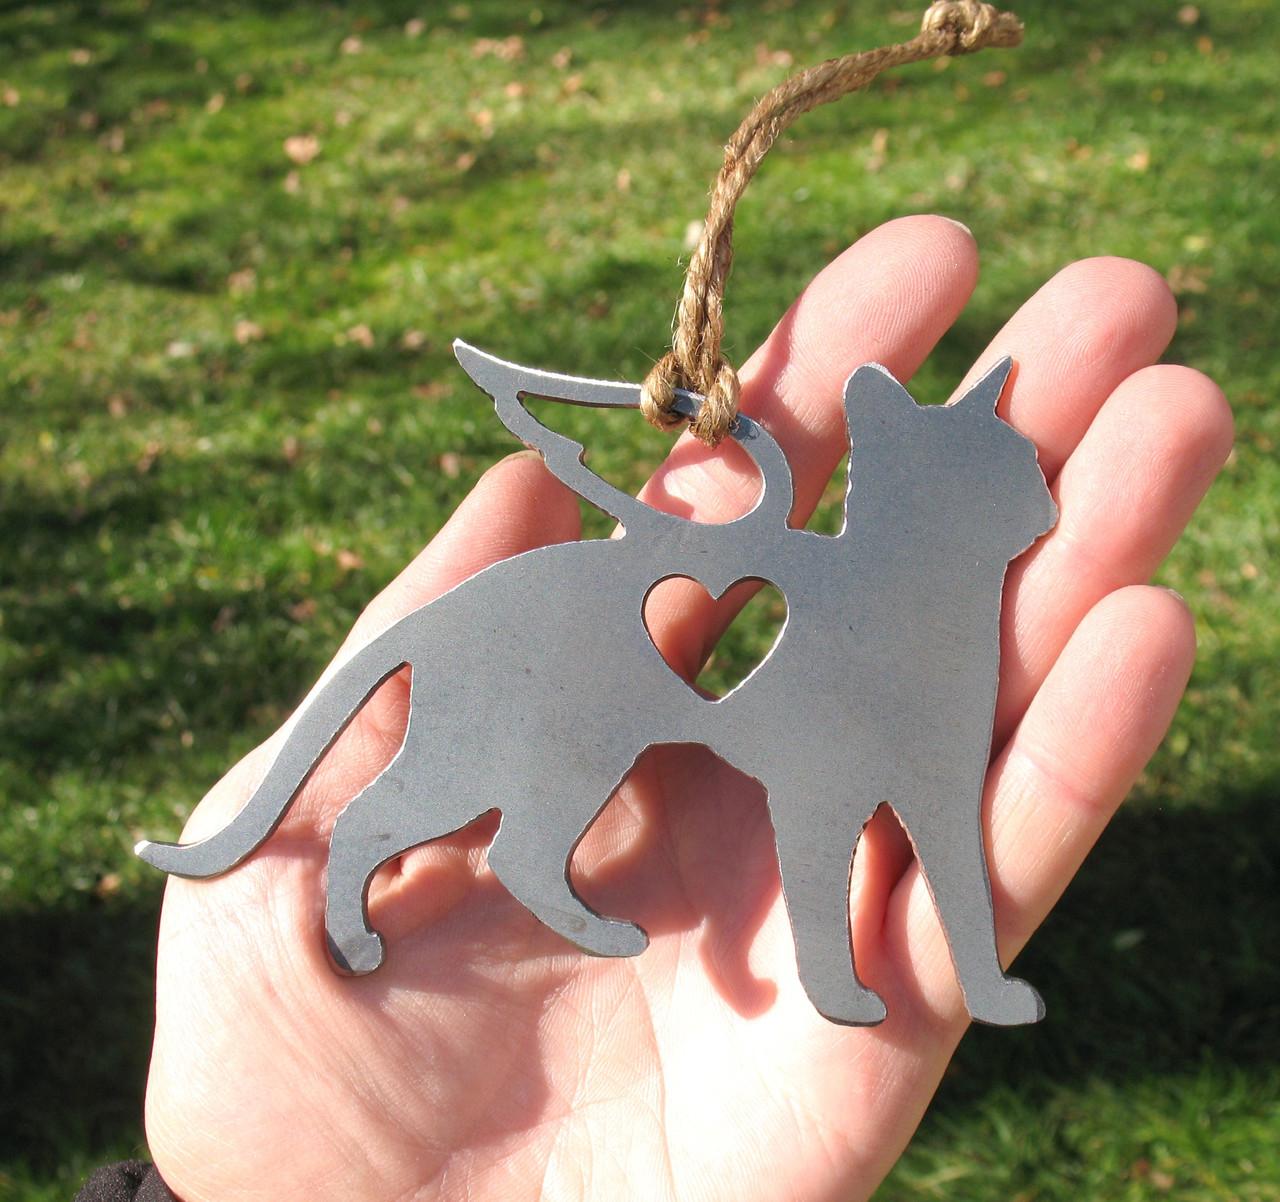 Abyssinian Cat Memorial Angel - Cat Loss Gift - Pet Loss Cat Sympathy Remembrance Gift - Metal Cat Christmas Ornament - Cat Lover